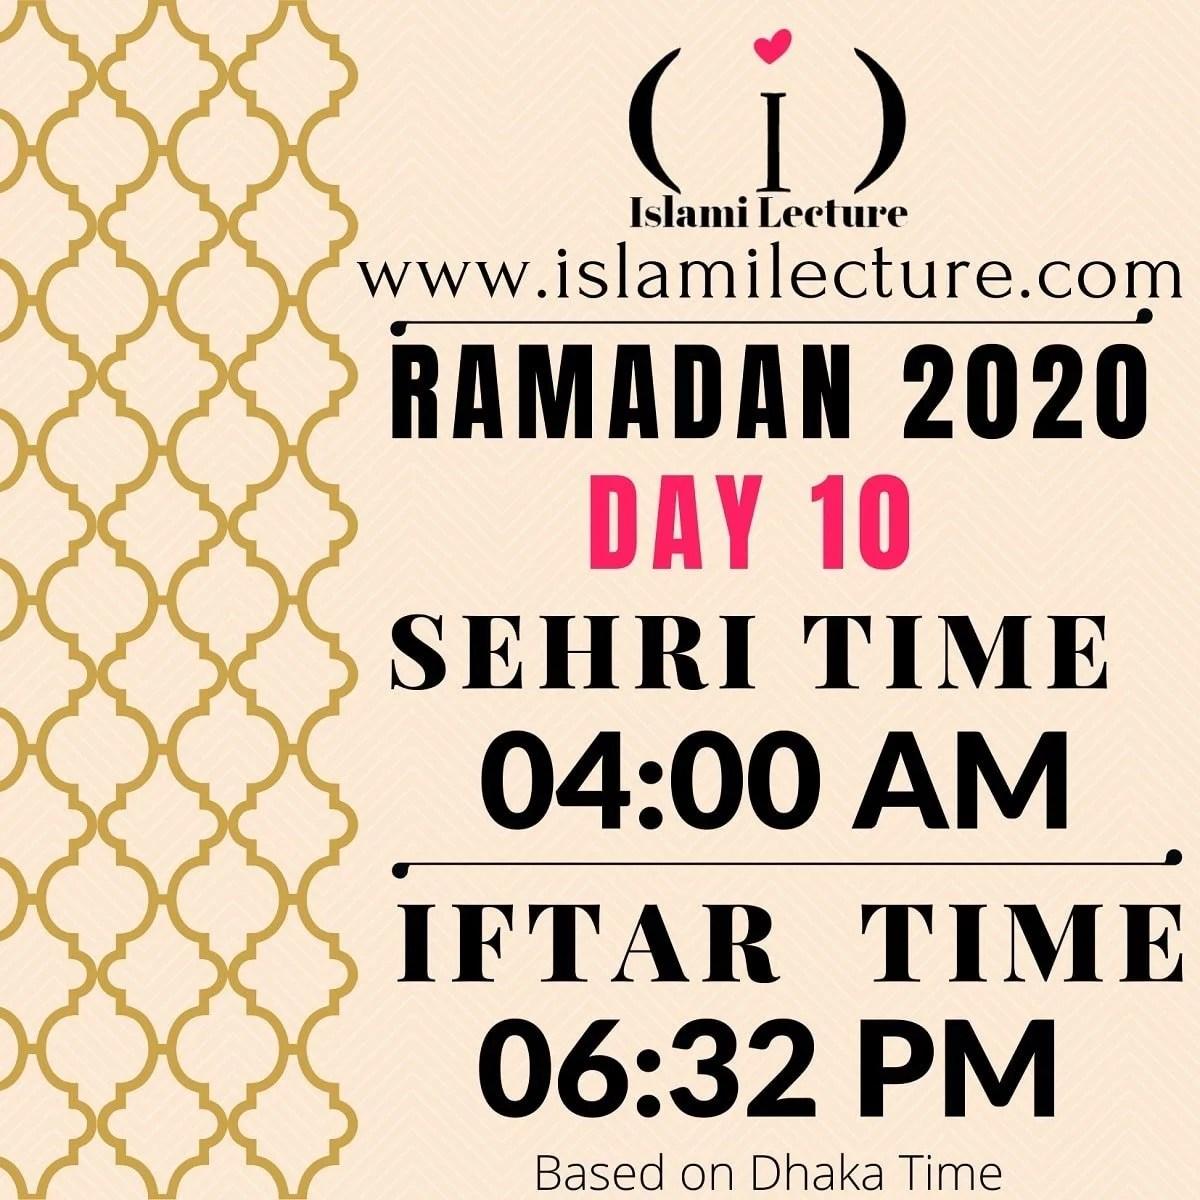 Dhaka Ramadan Time 2020 Sehri & Iftar Time (Day 10)